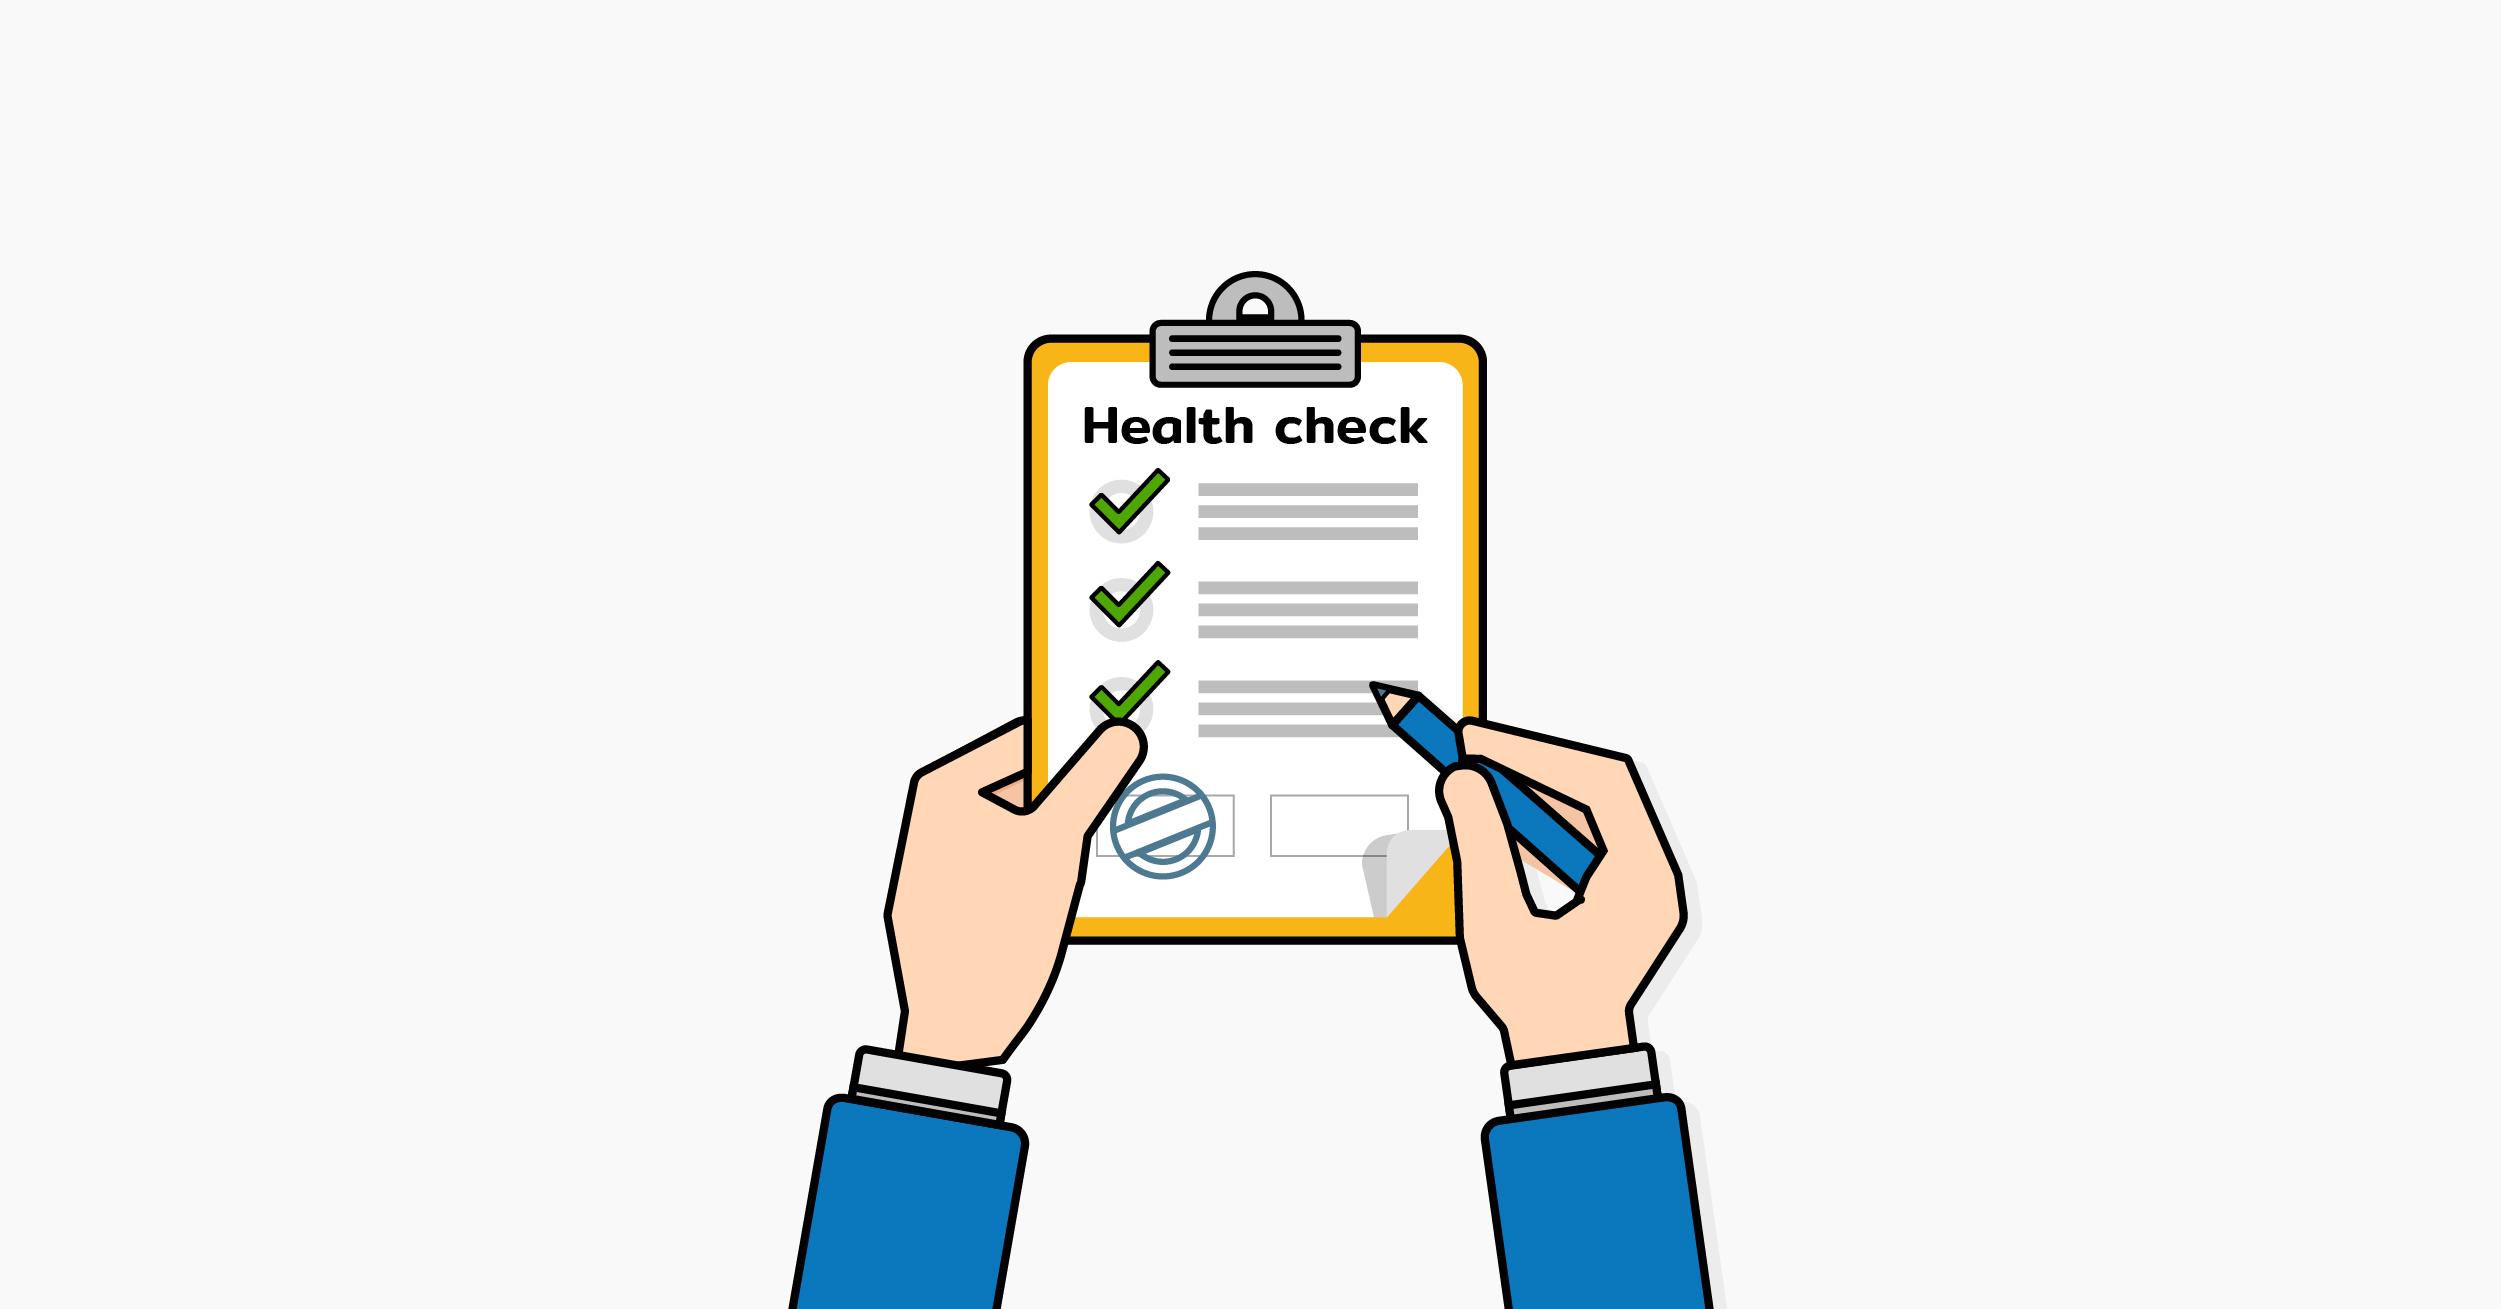 Brand Health Check เช็คสุขภาพให้แบรนด์ด้วย Social Listening tool